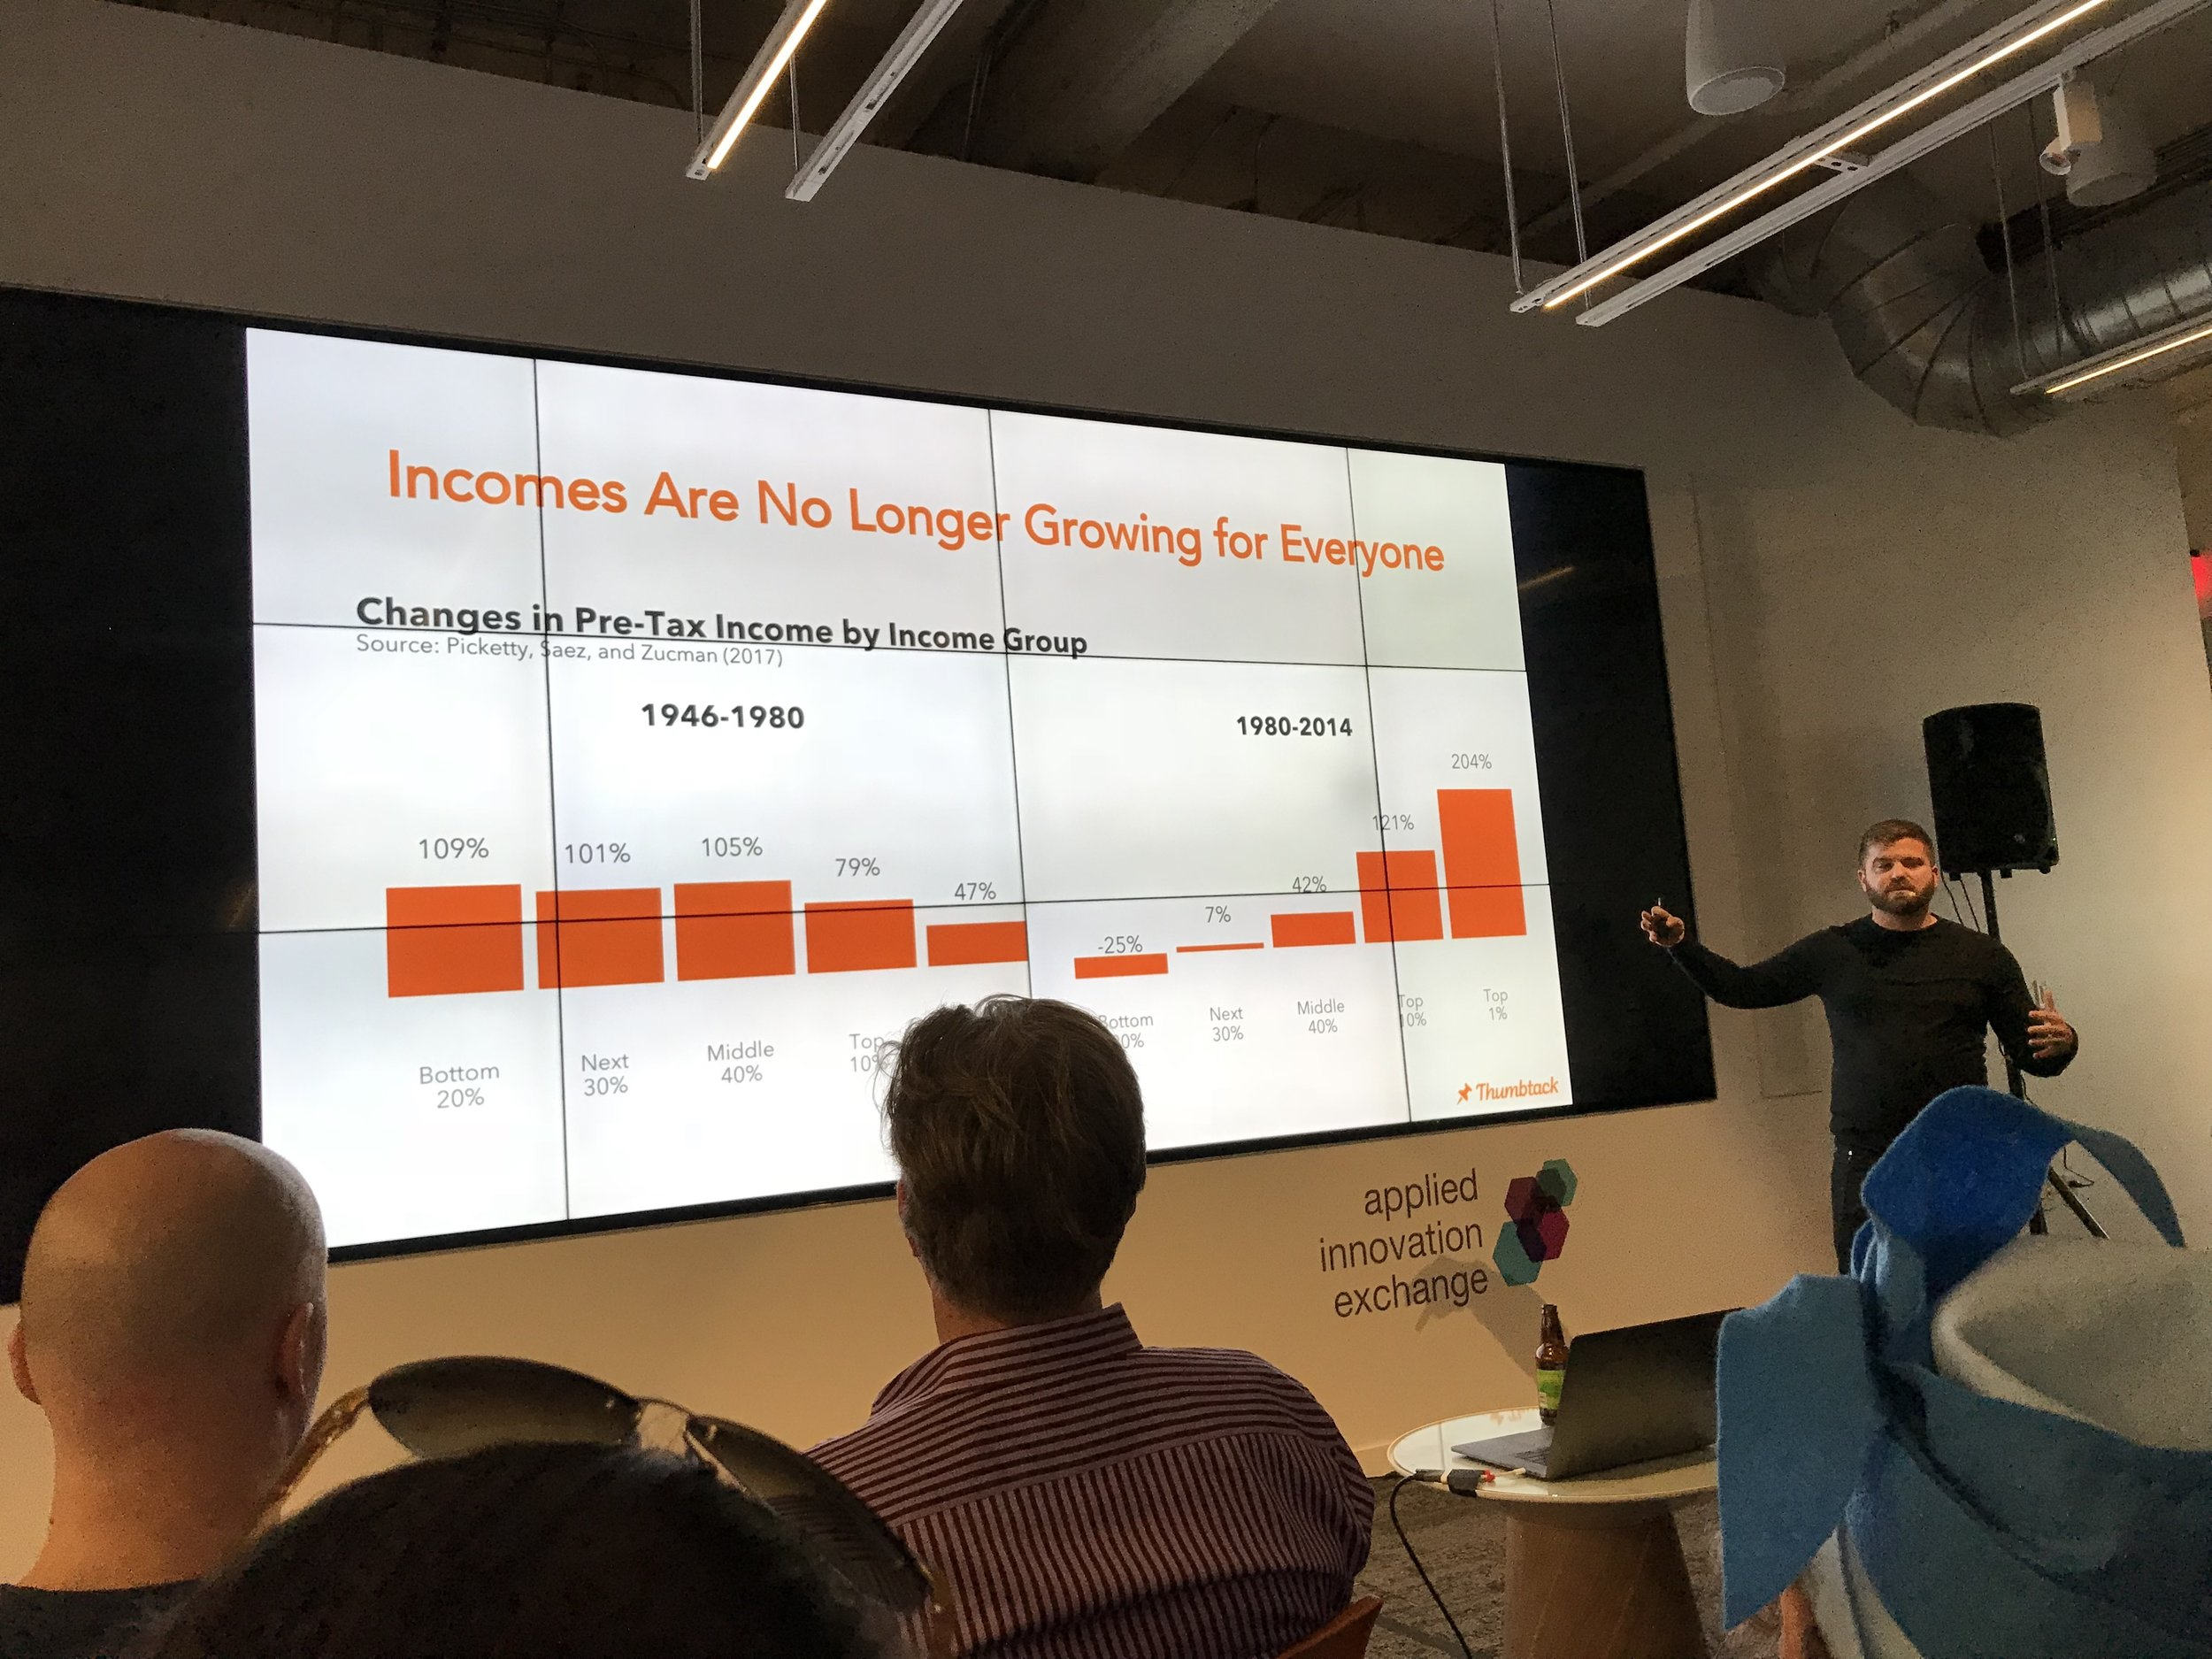 Thumbtack Incomes Are No Longer Growing for Everyone.JPG